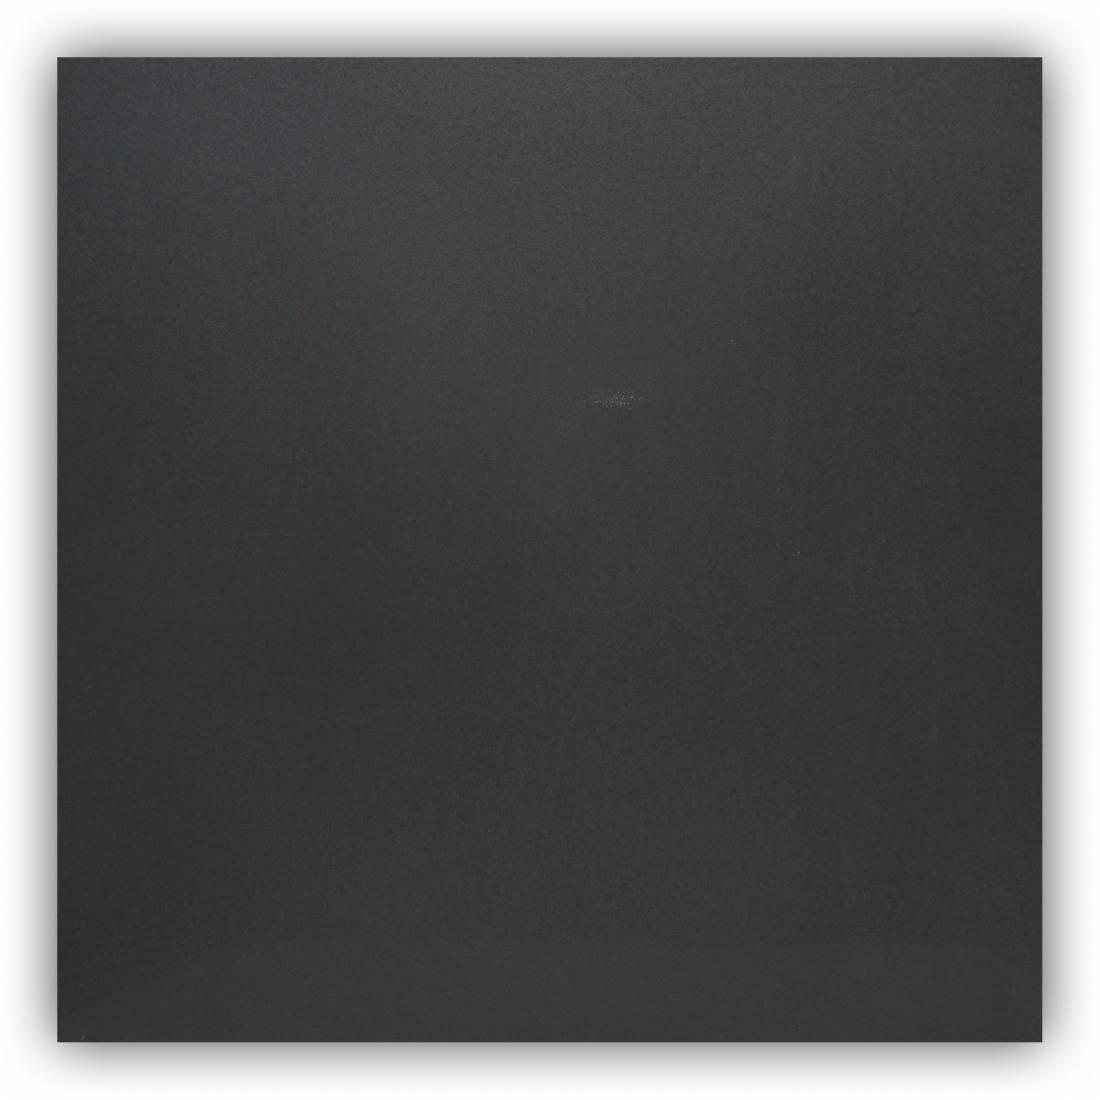 Crystal 60x60 Black 1